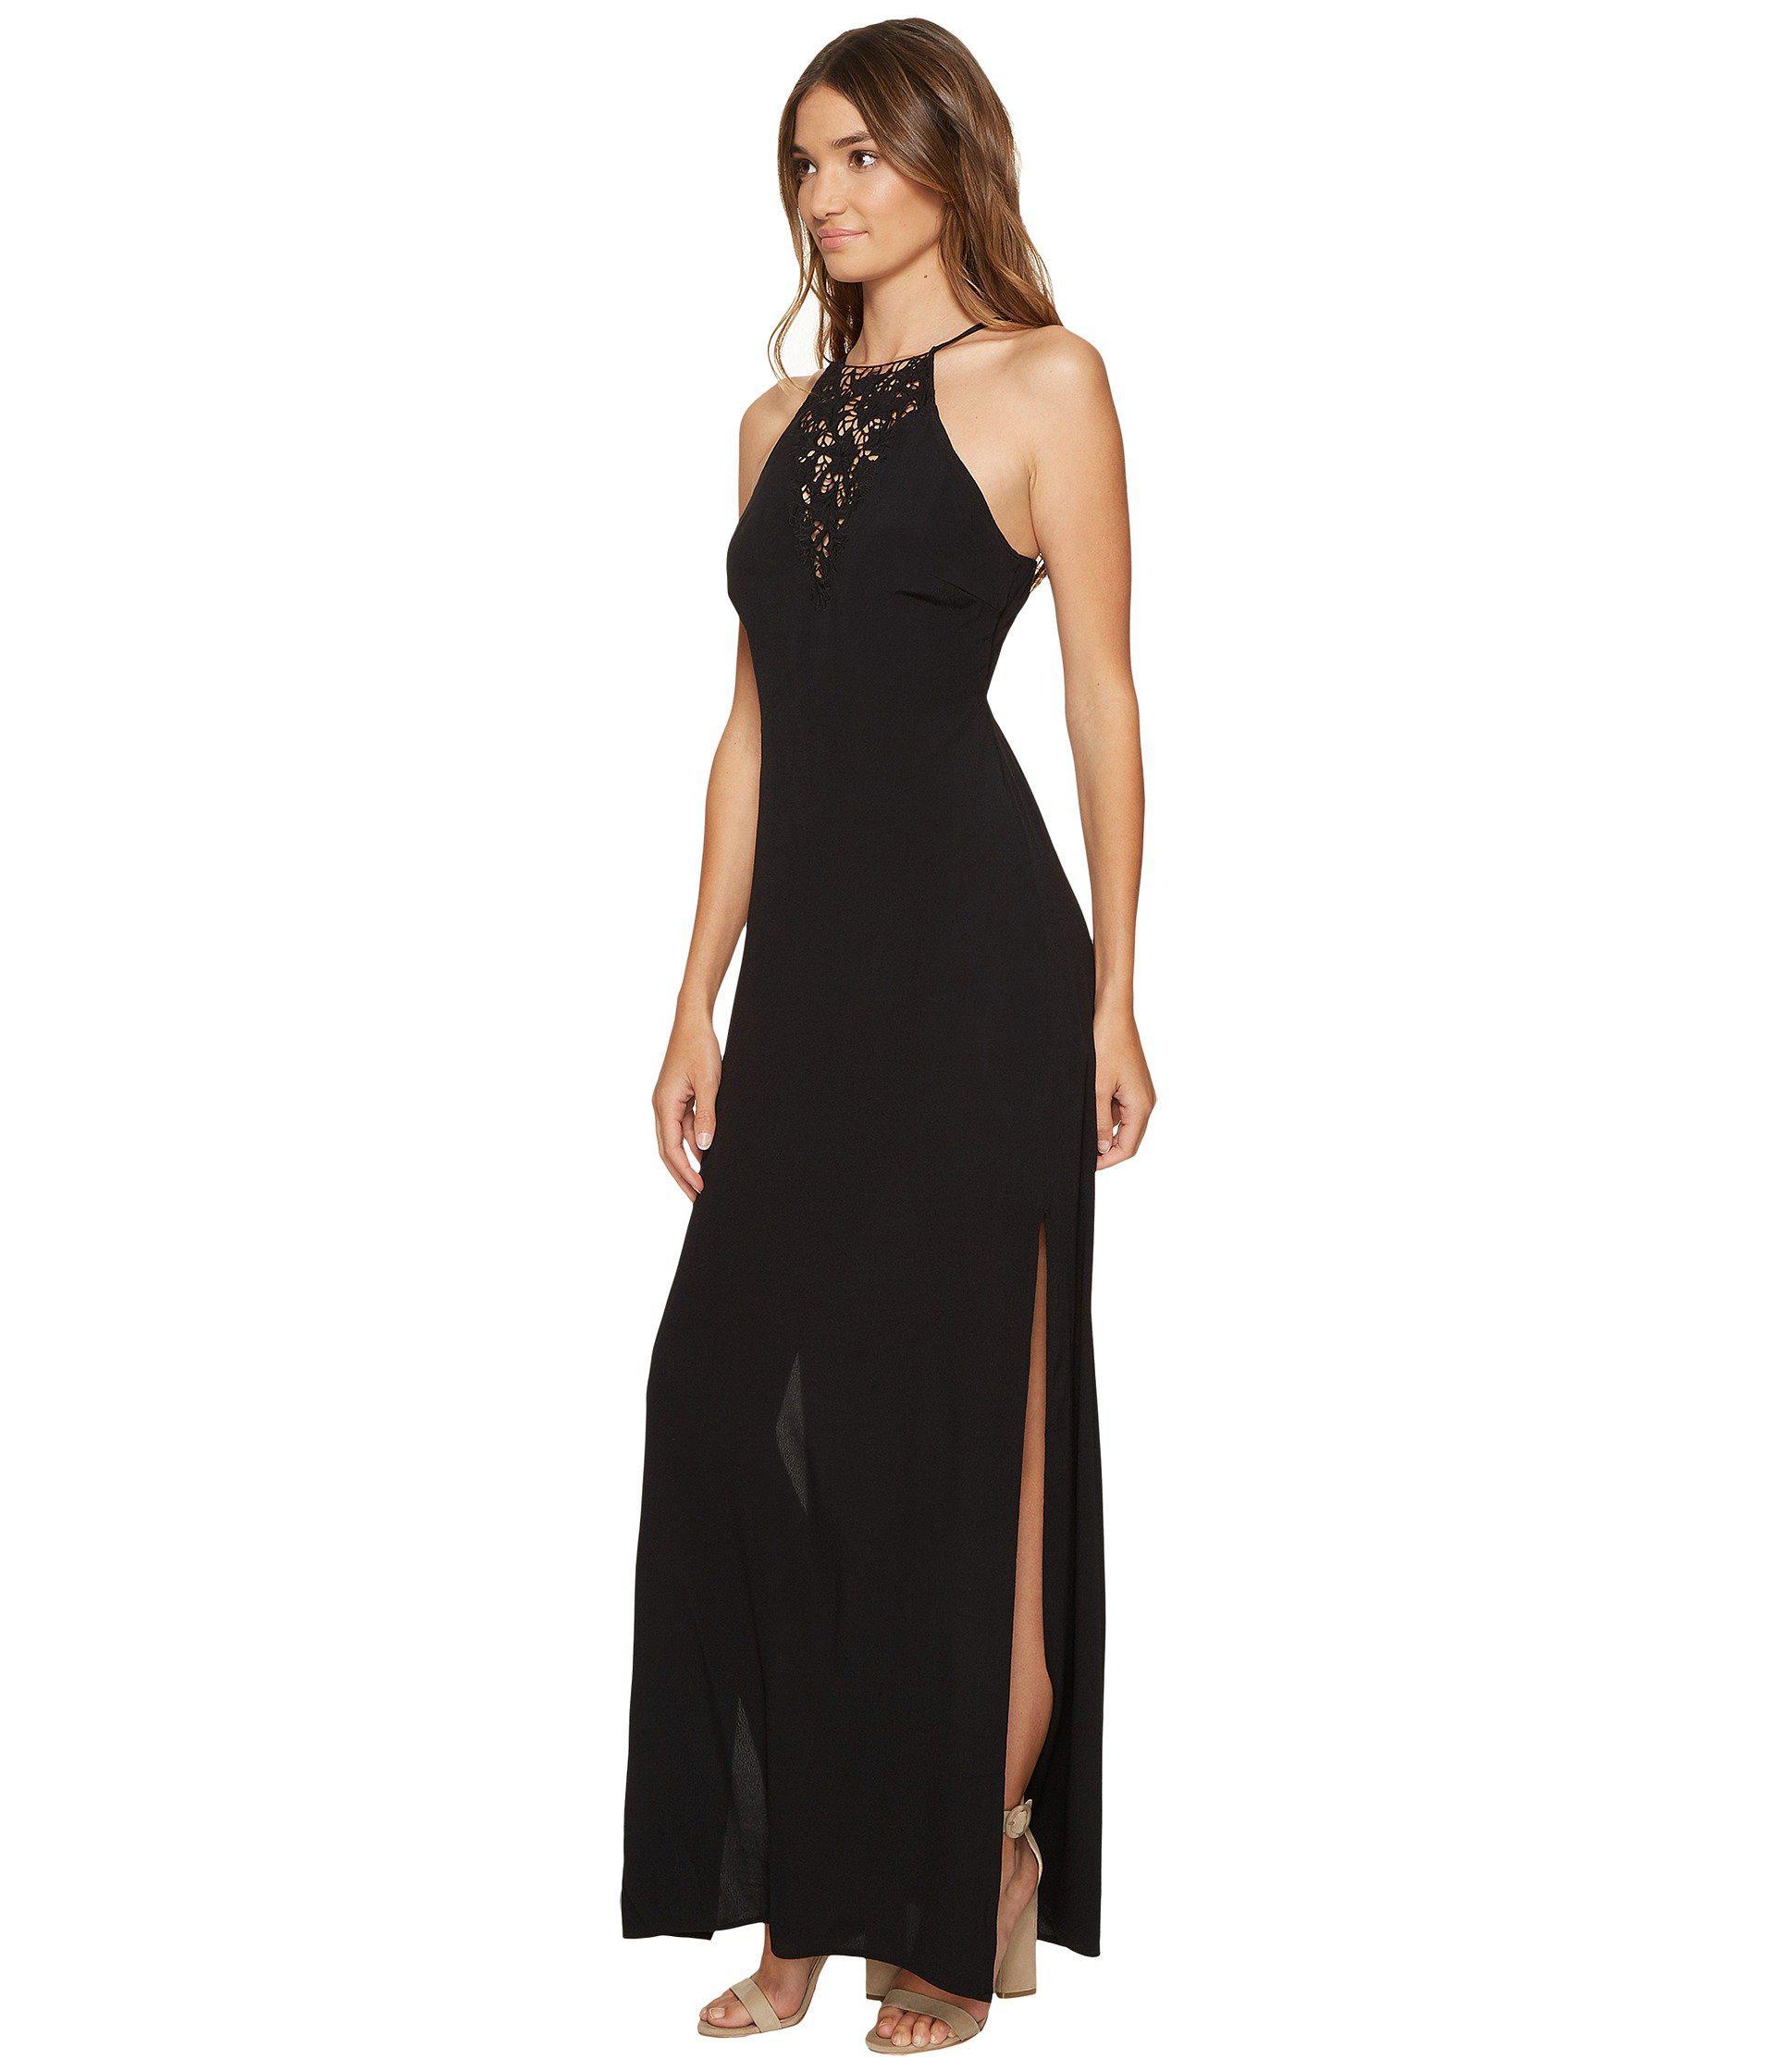 c5a4af51 Lyst - Astr Petra Dress in Black